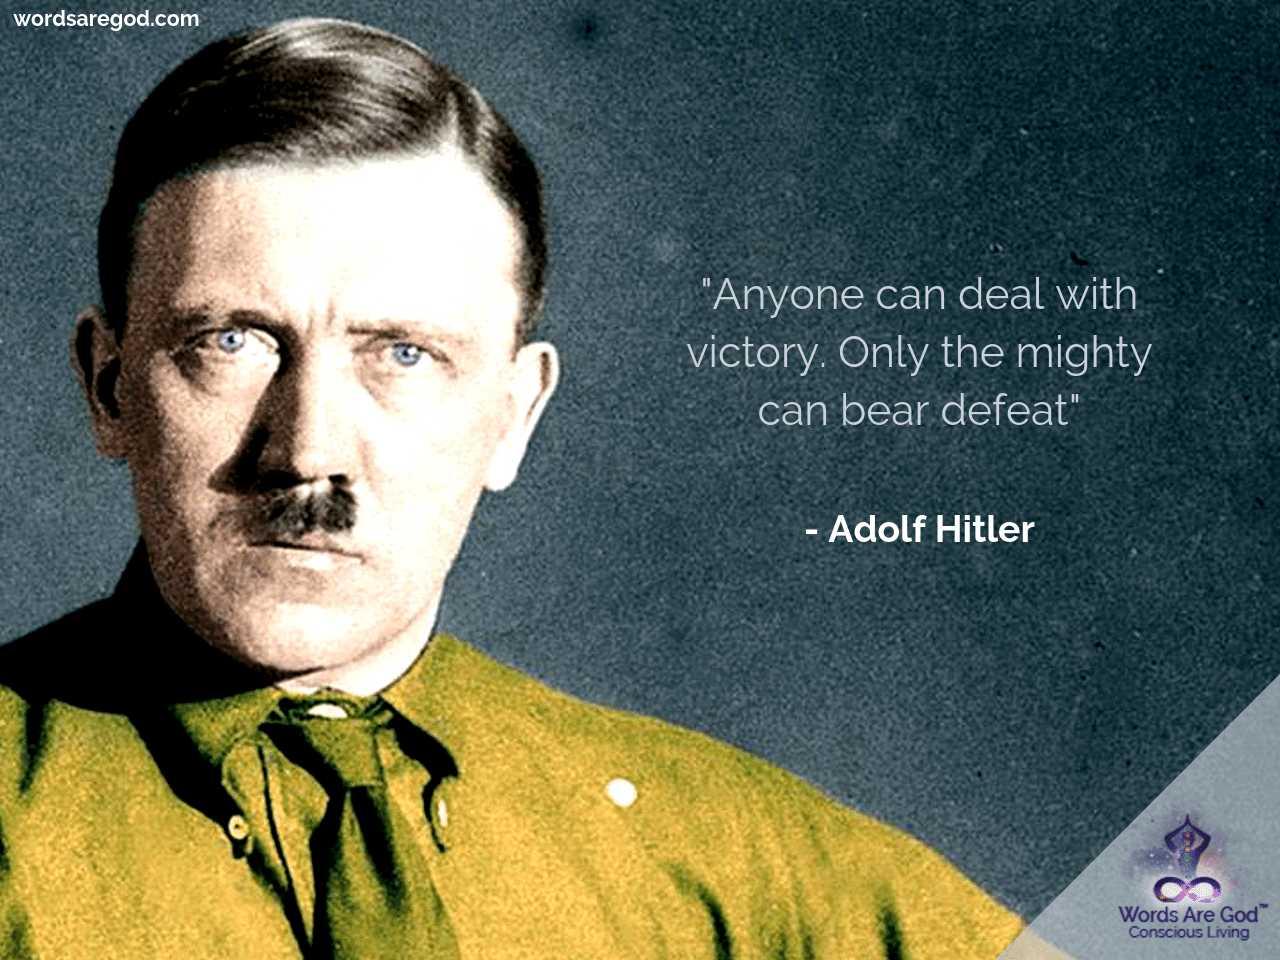 Adolf Hitler Life Quote by Adolf Hitler